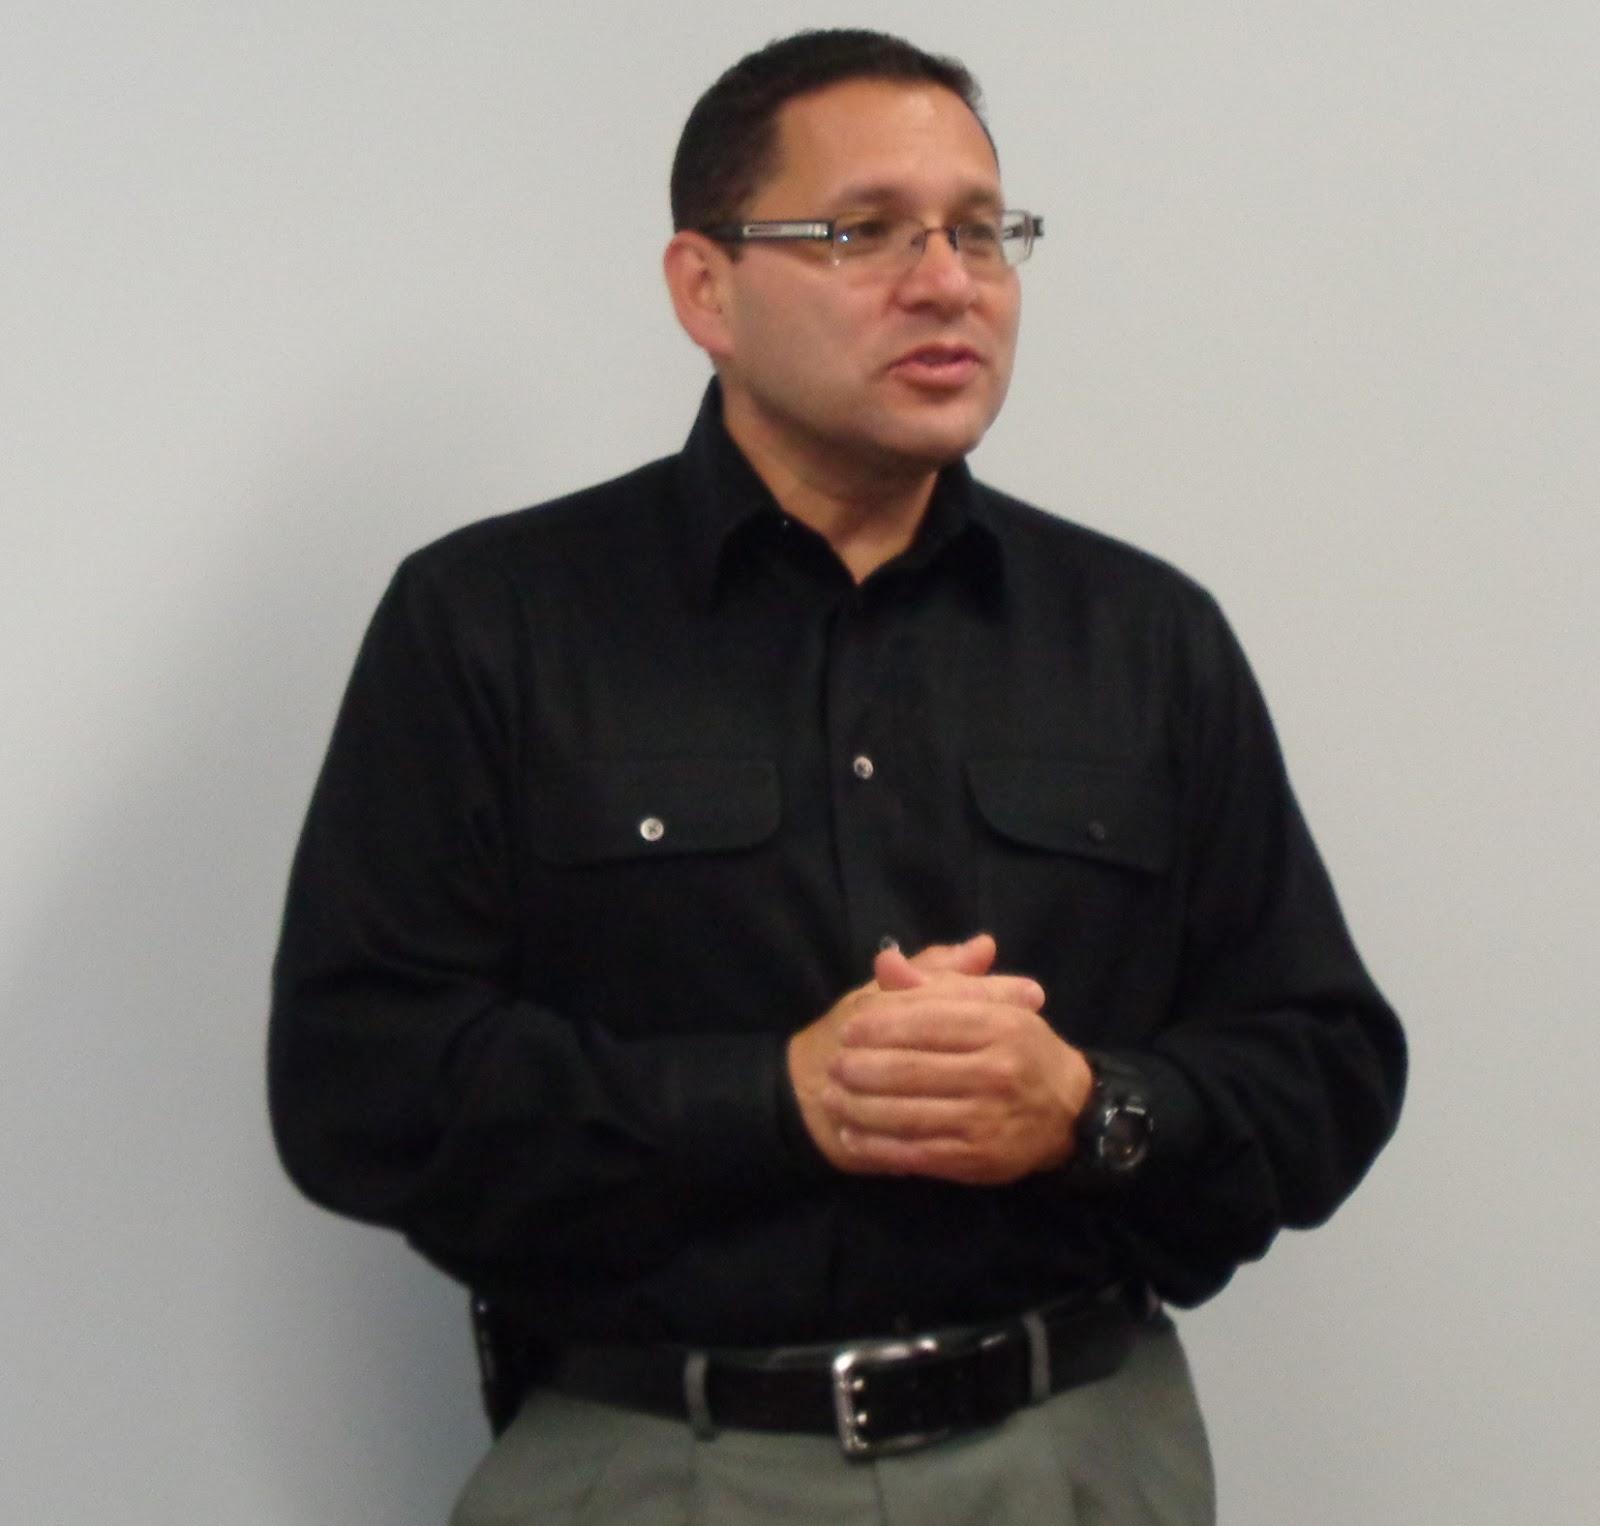 Plaintalker II Who Is Carlos Sanchez